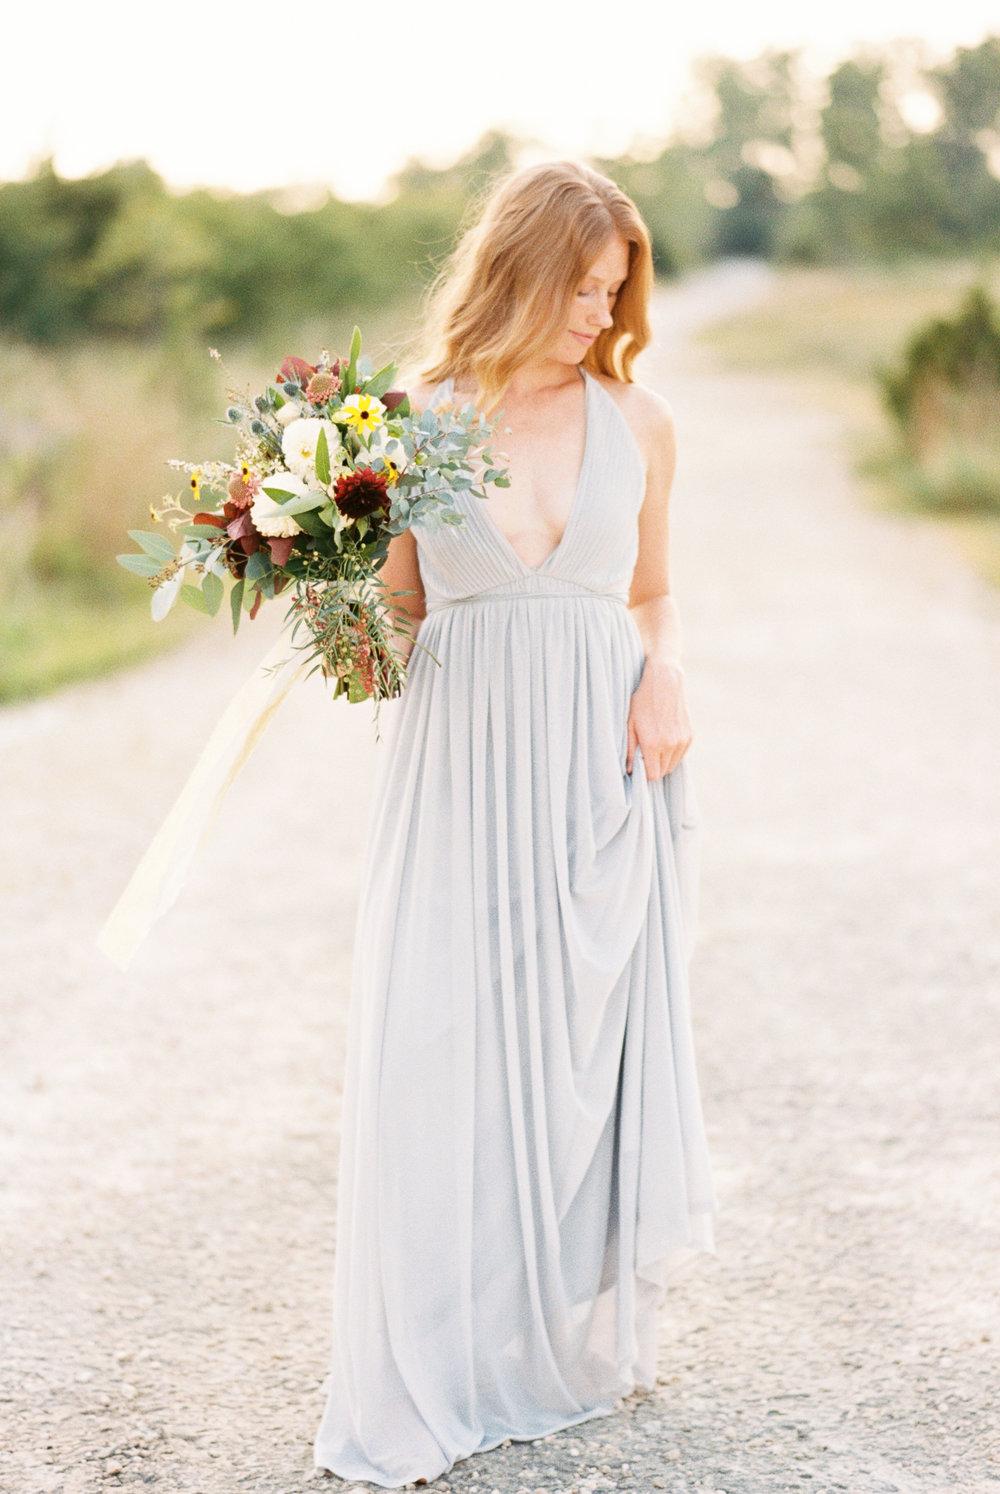 Fine_Art_Film_Wedding_Photographer_Tonya_Espy_Photography-21.jpg